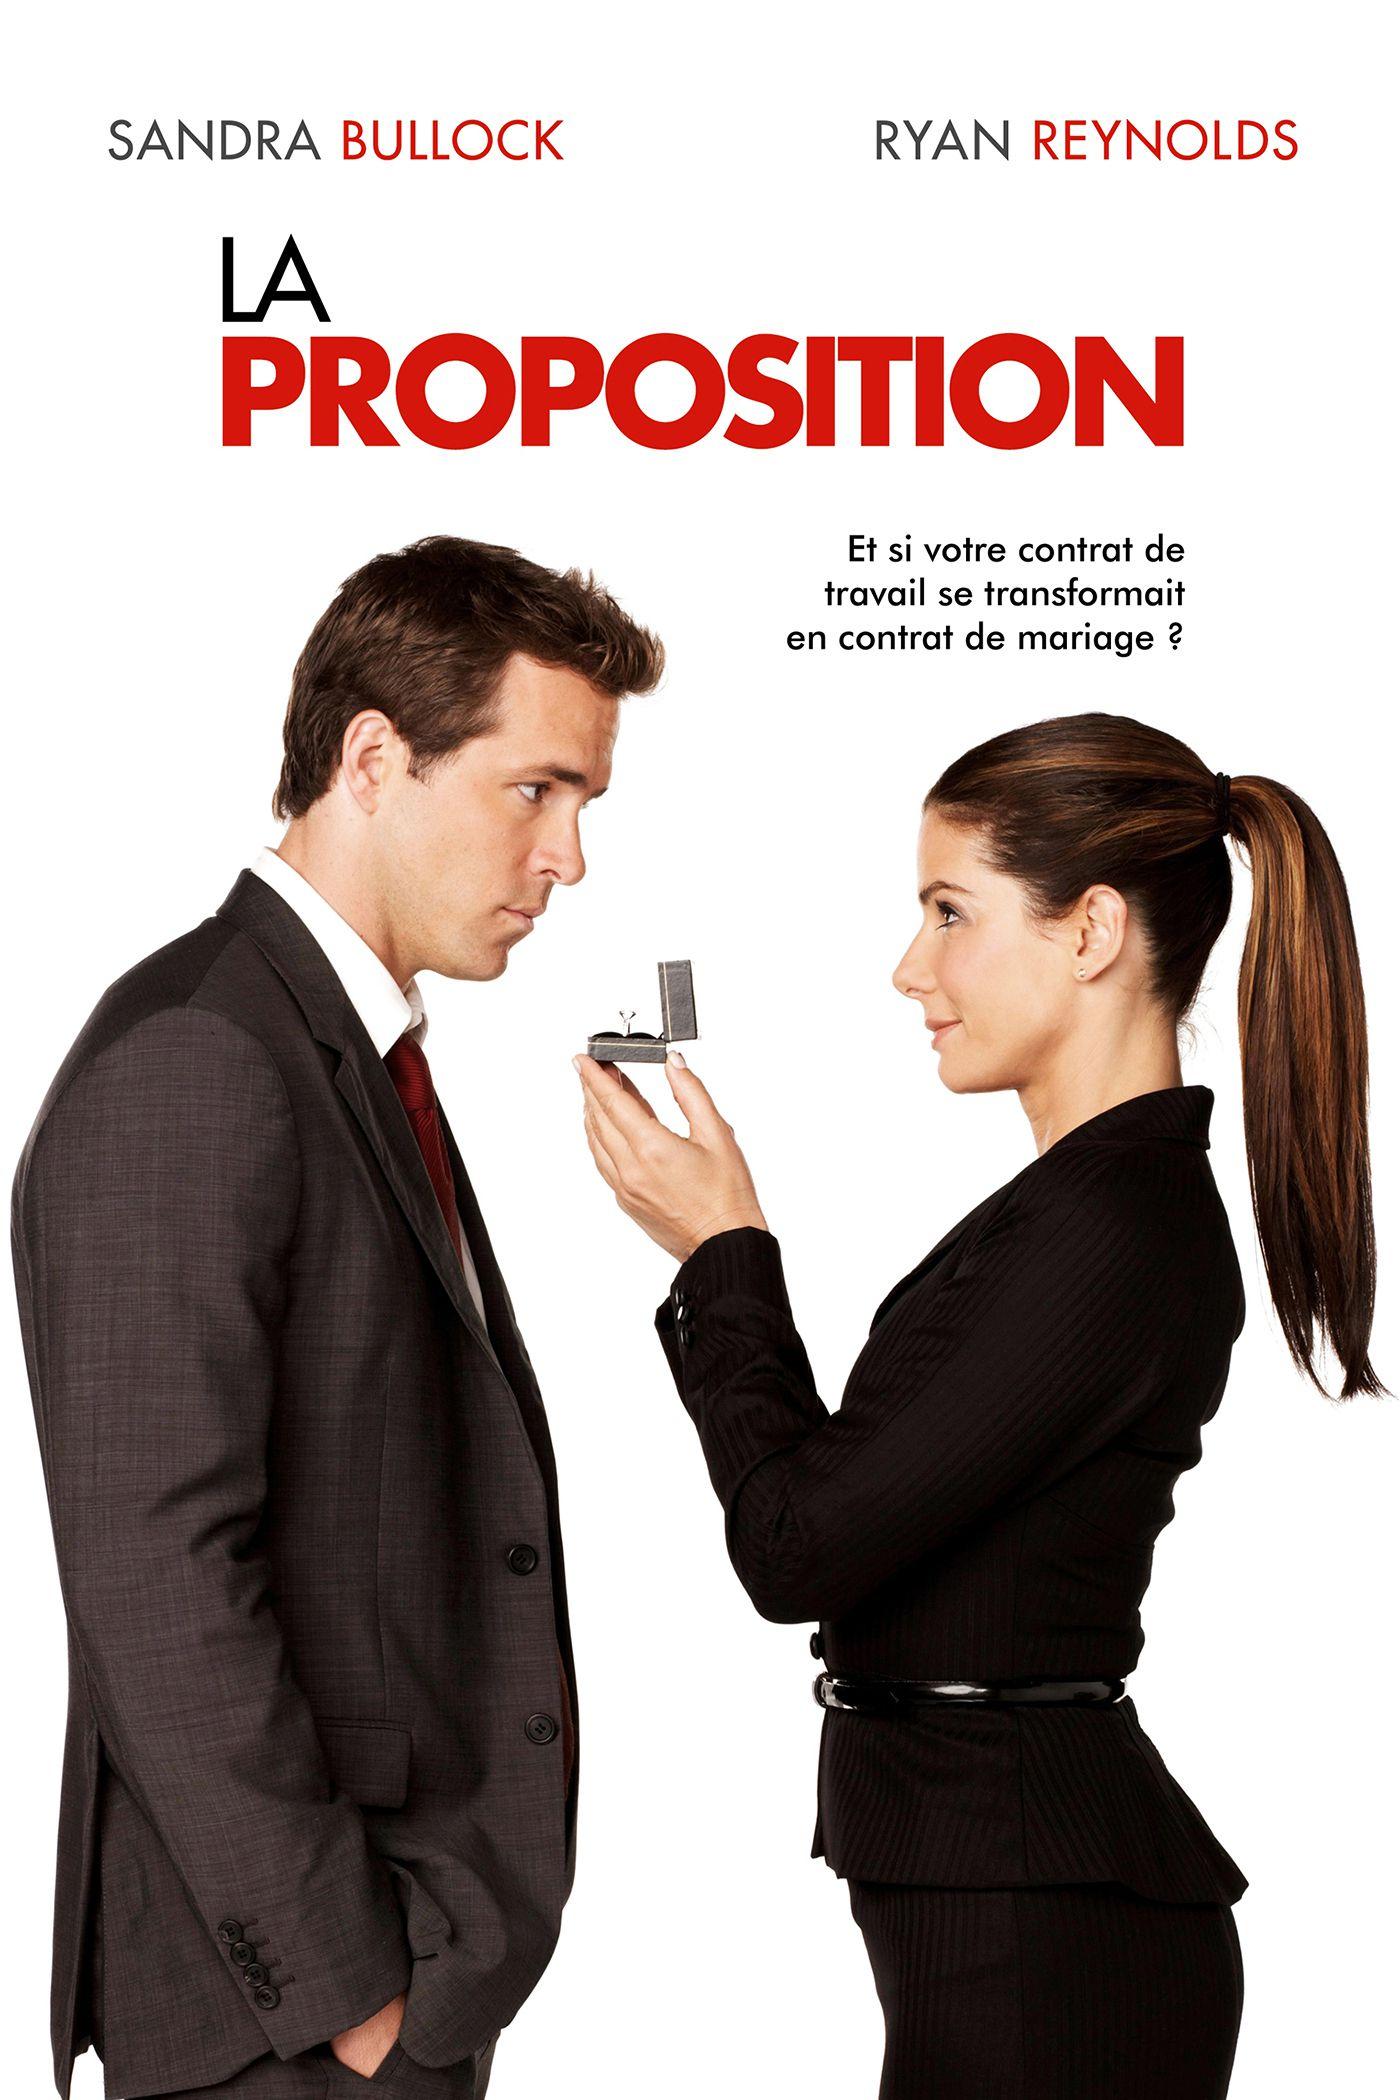 Affiche Poster proposition proposal disney touchstone